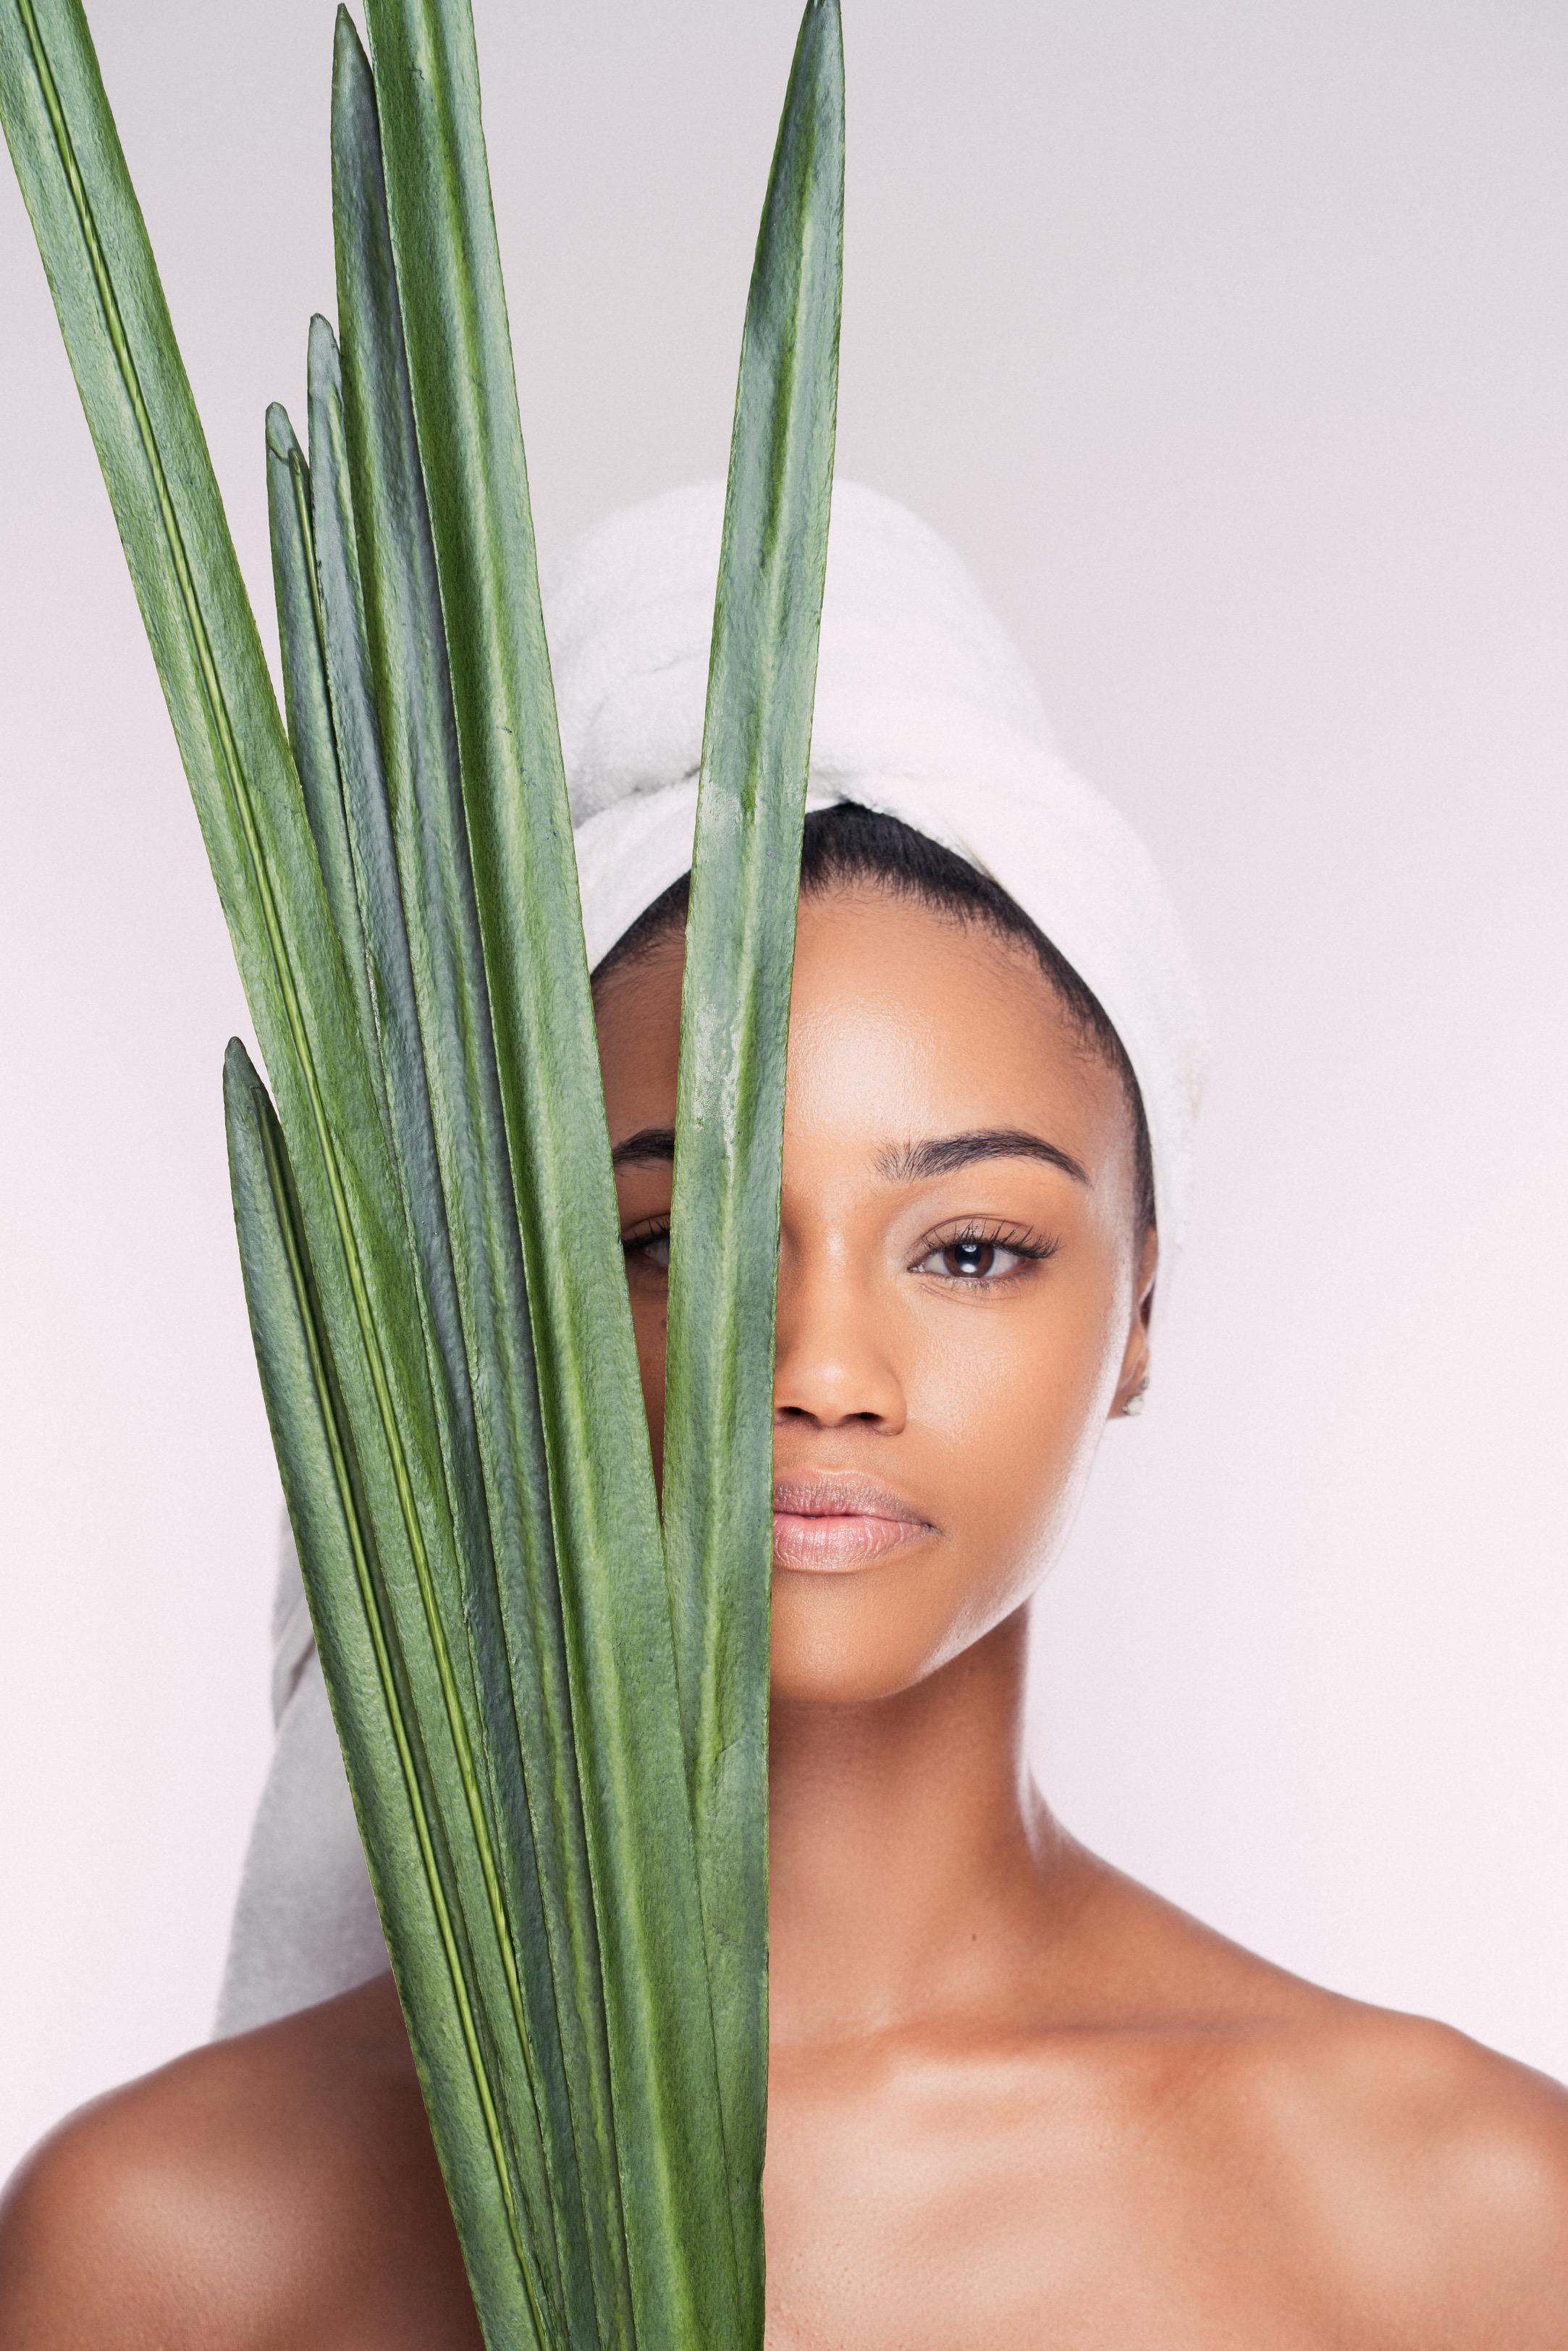 Clean Skin Headshot 02102-Edit.JPG